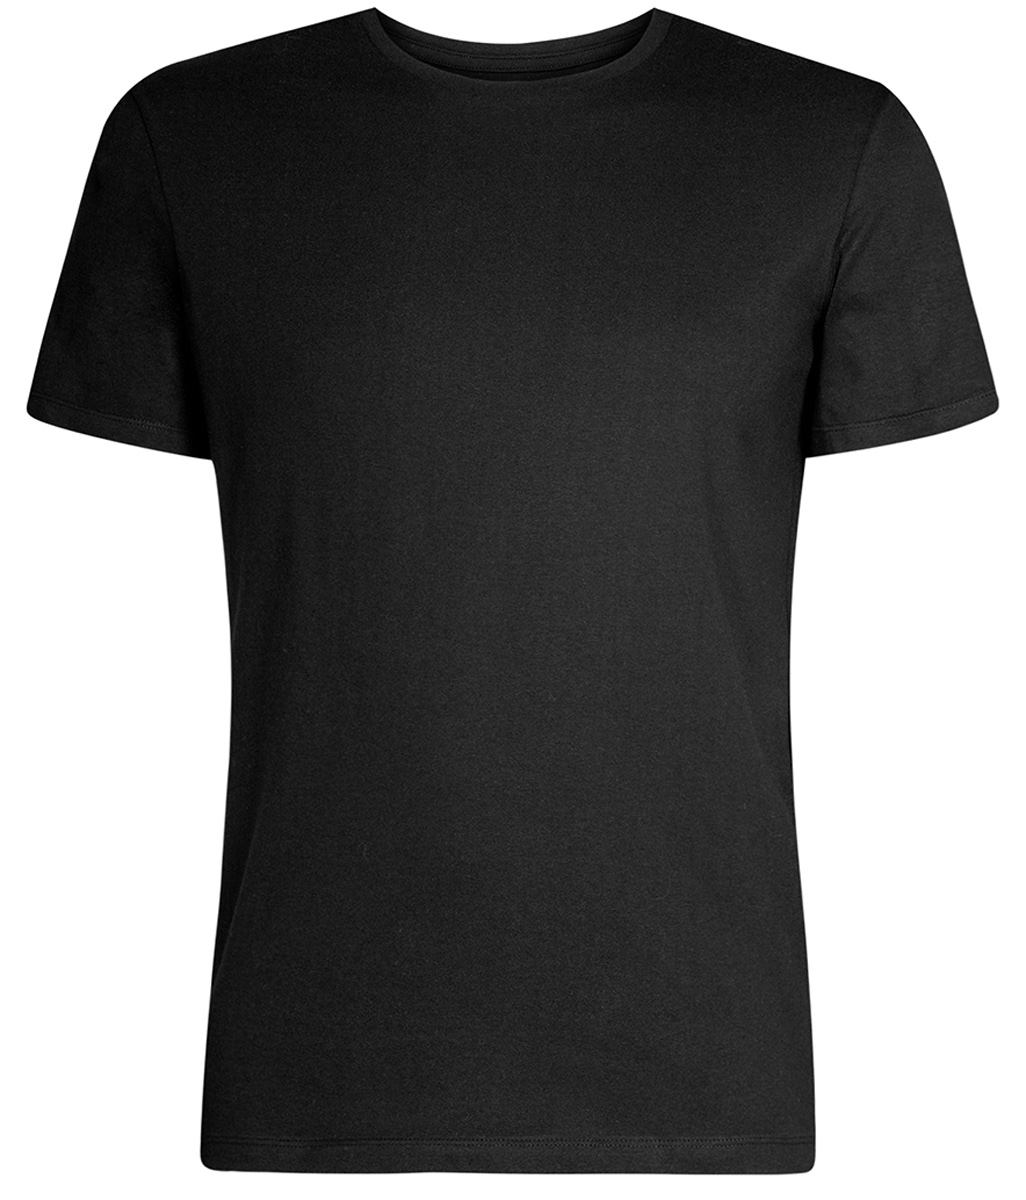 Футболка мужская oodji Basic, цвет: черный. 5B611003M/44135N/2900N. Размер S (46/48)5B611003M/44135N/2900NКомфортная мужская футболка от oodji с короткими рукавами и круглым вырезом горловины выполнена из натурального хлопка.